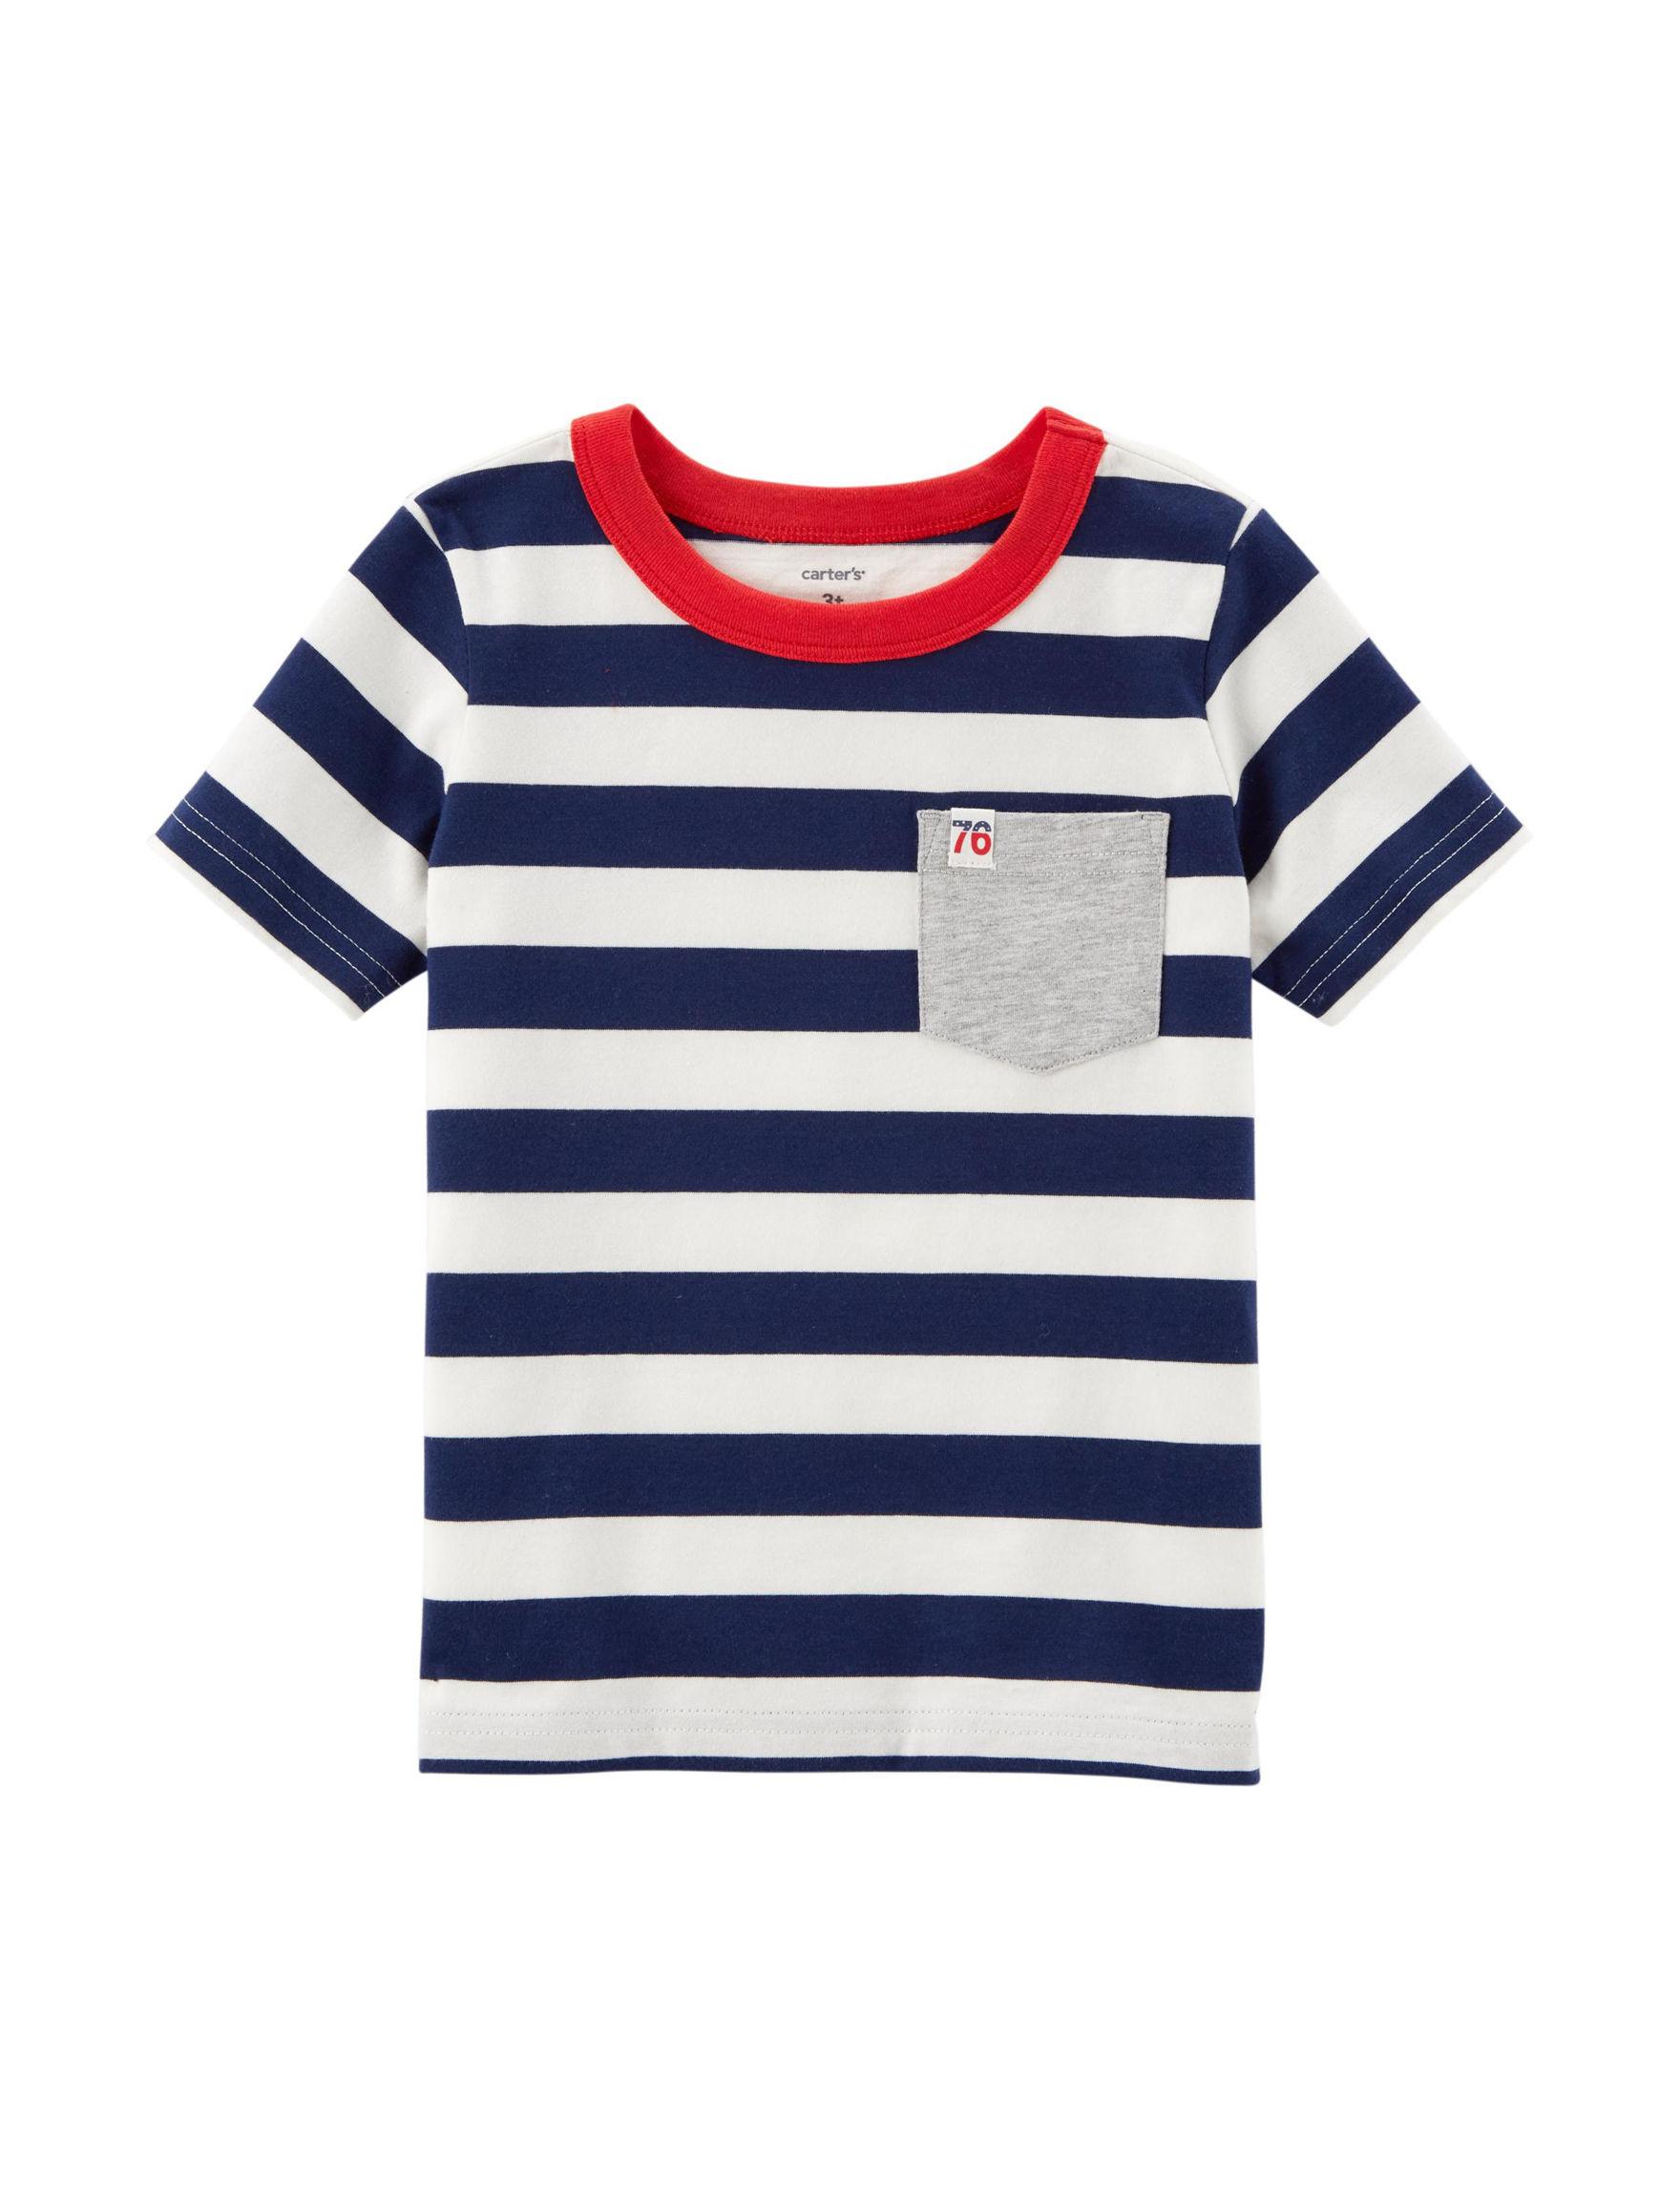 Carter's Navy Stripe Tees & Tanks